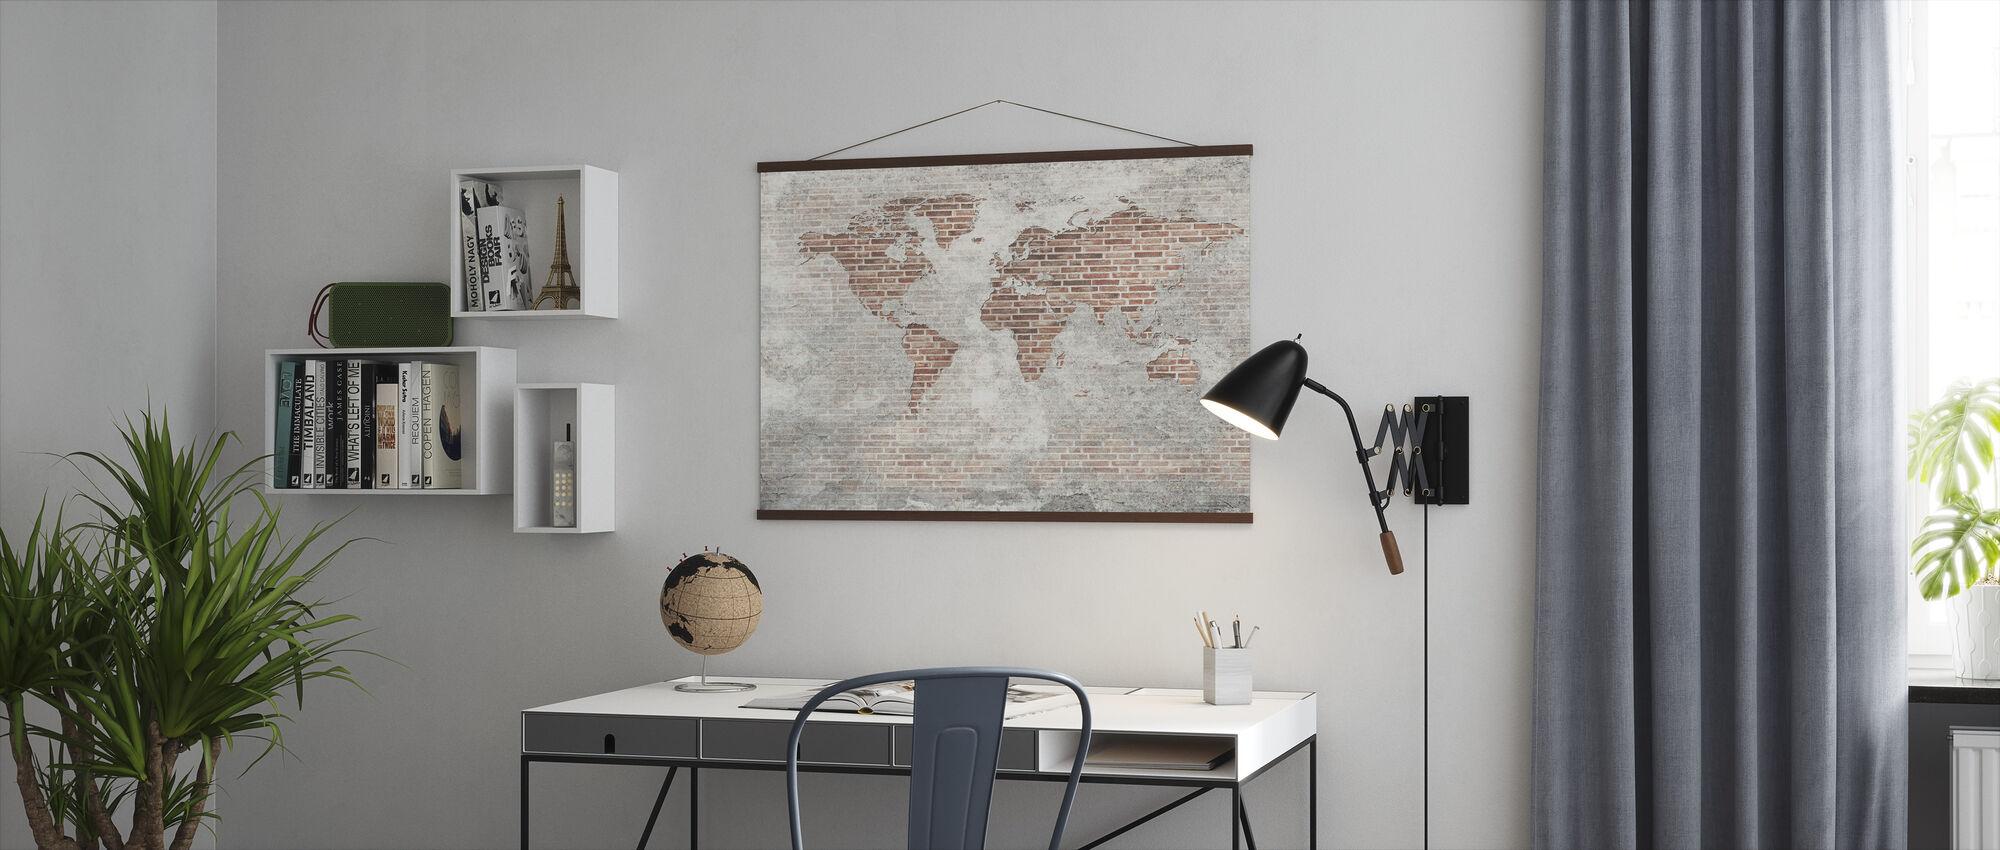 Brick Wall Wereld Kaart - Poster - Kantoor